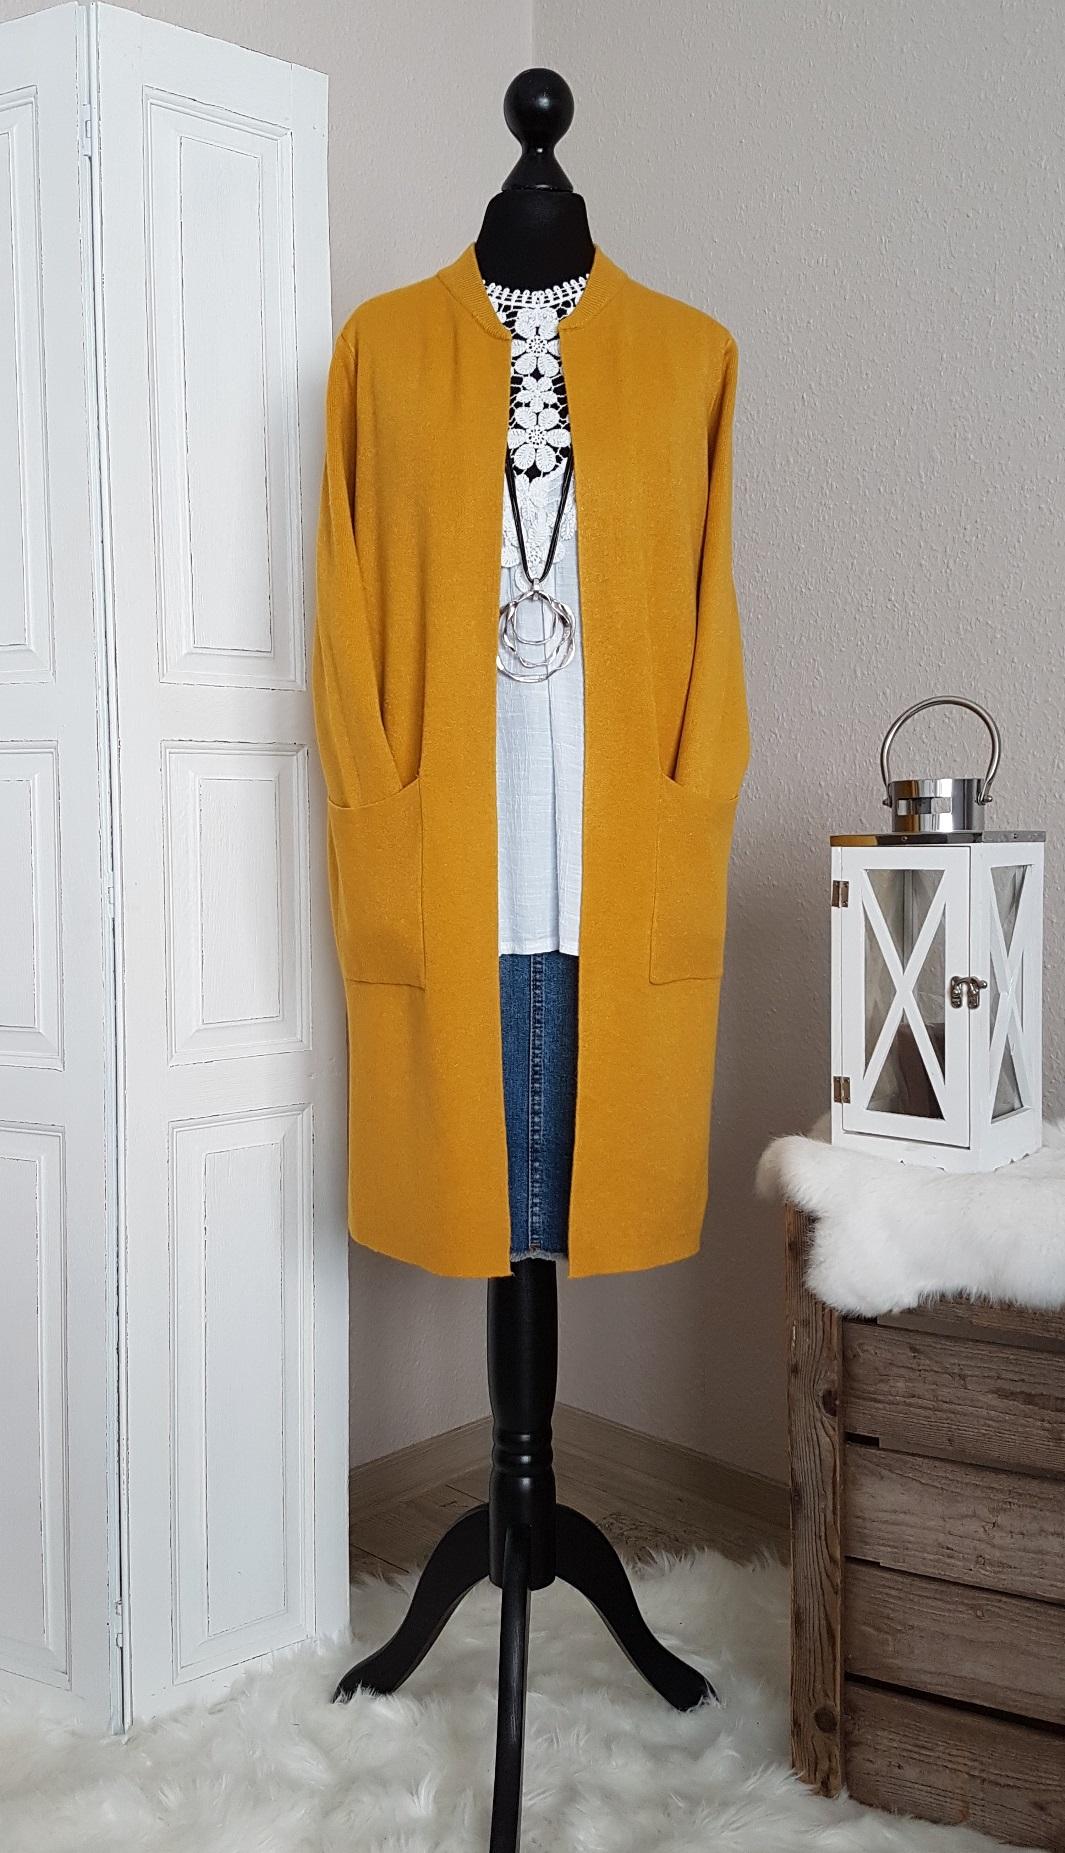 DENGZI Winterm/äntel F/ür Frauen Langarm Cardigan Jacke Farbblock Open Front Fashion Mantel